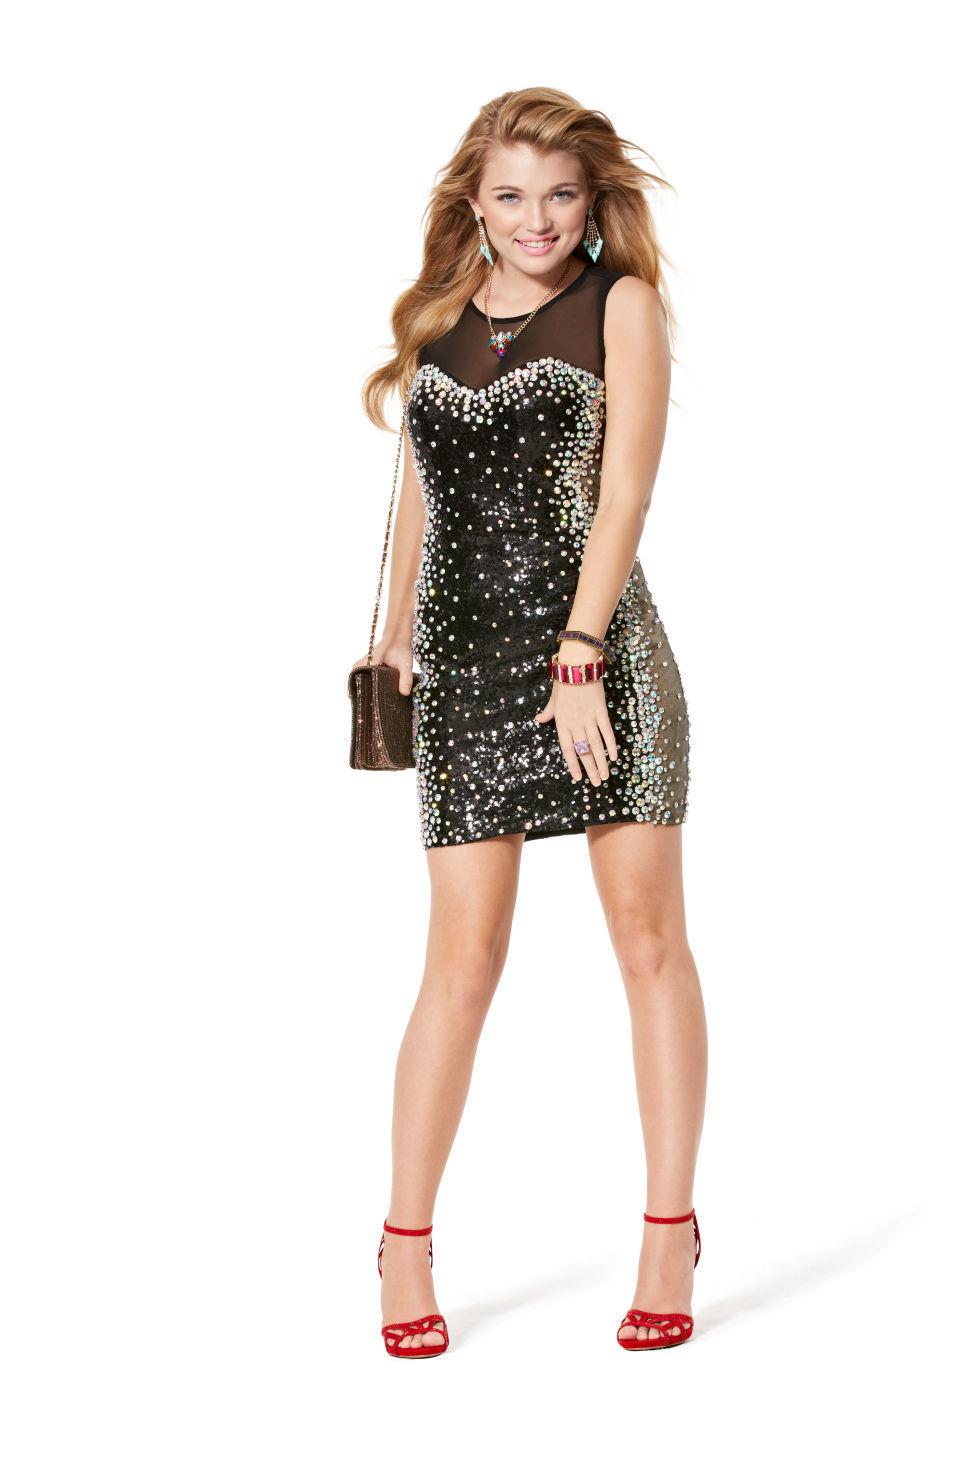 Forum on this topic: One Slip Dress, Three Different Ways, one-slip-dress-three-different-ways/